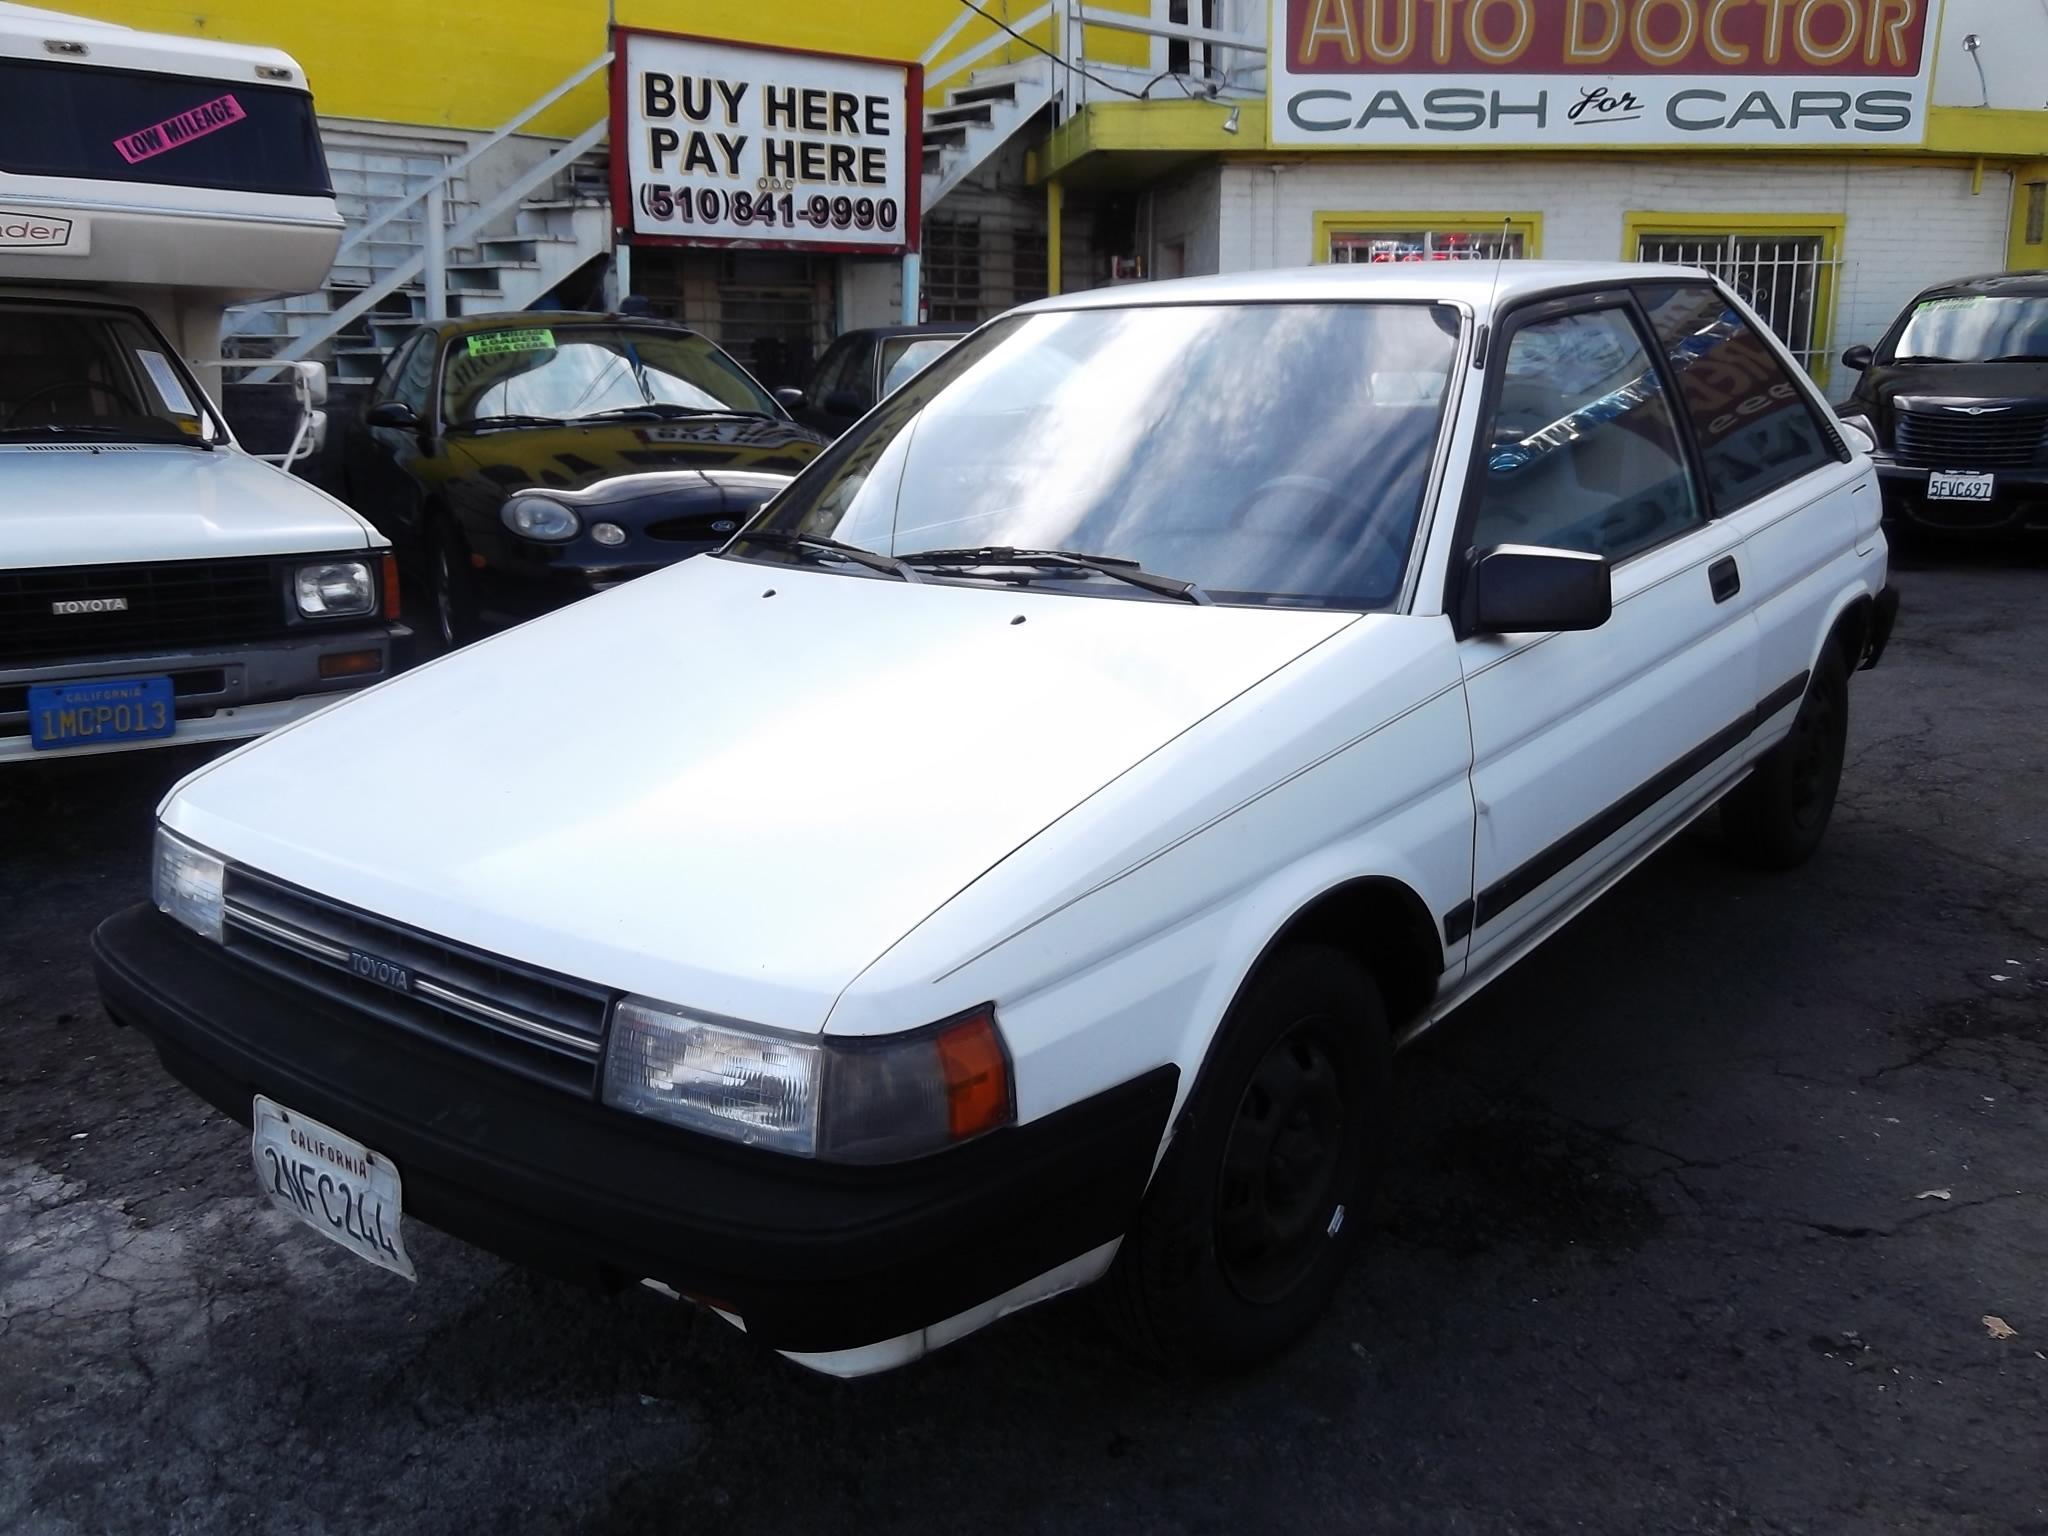 Auto Doctor 1830 San Pablo Ave Berkeley CA YP